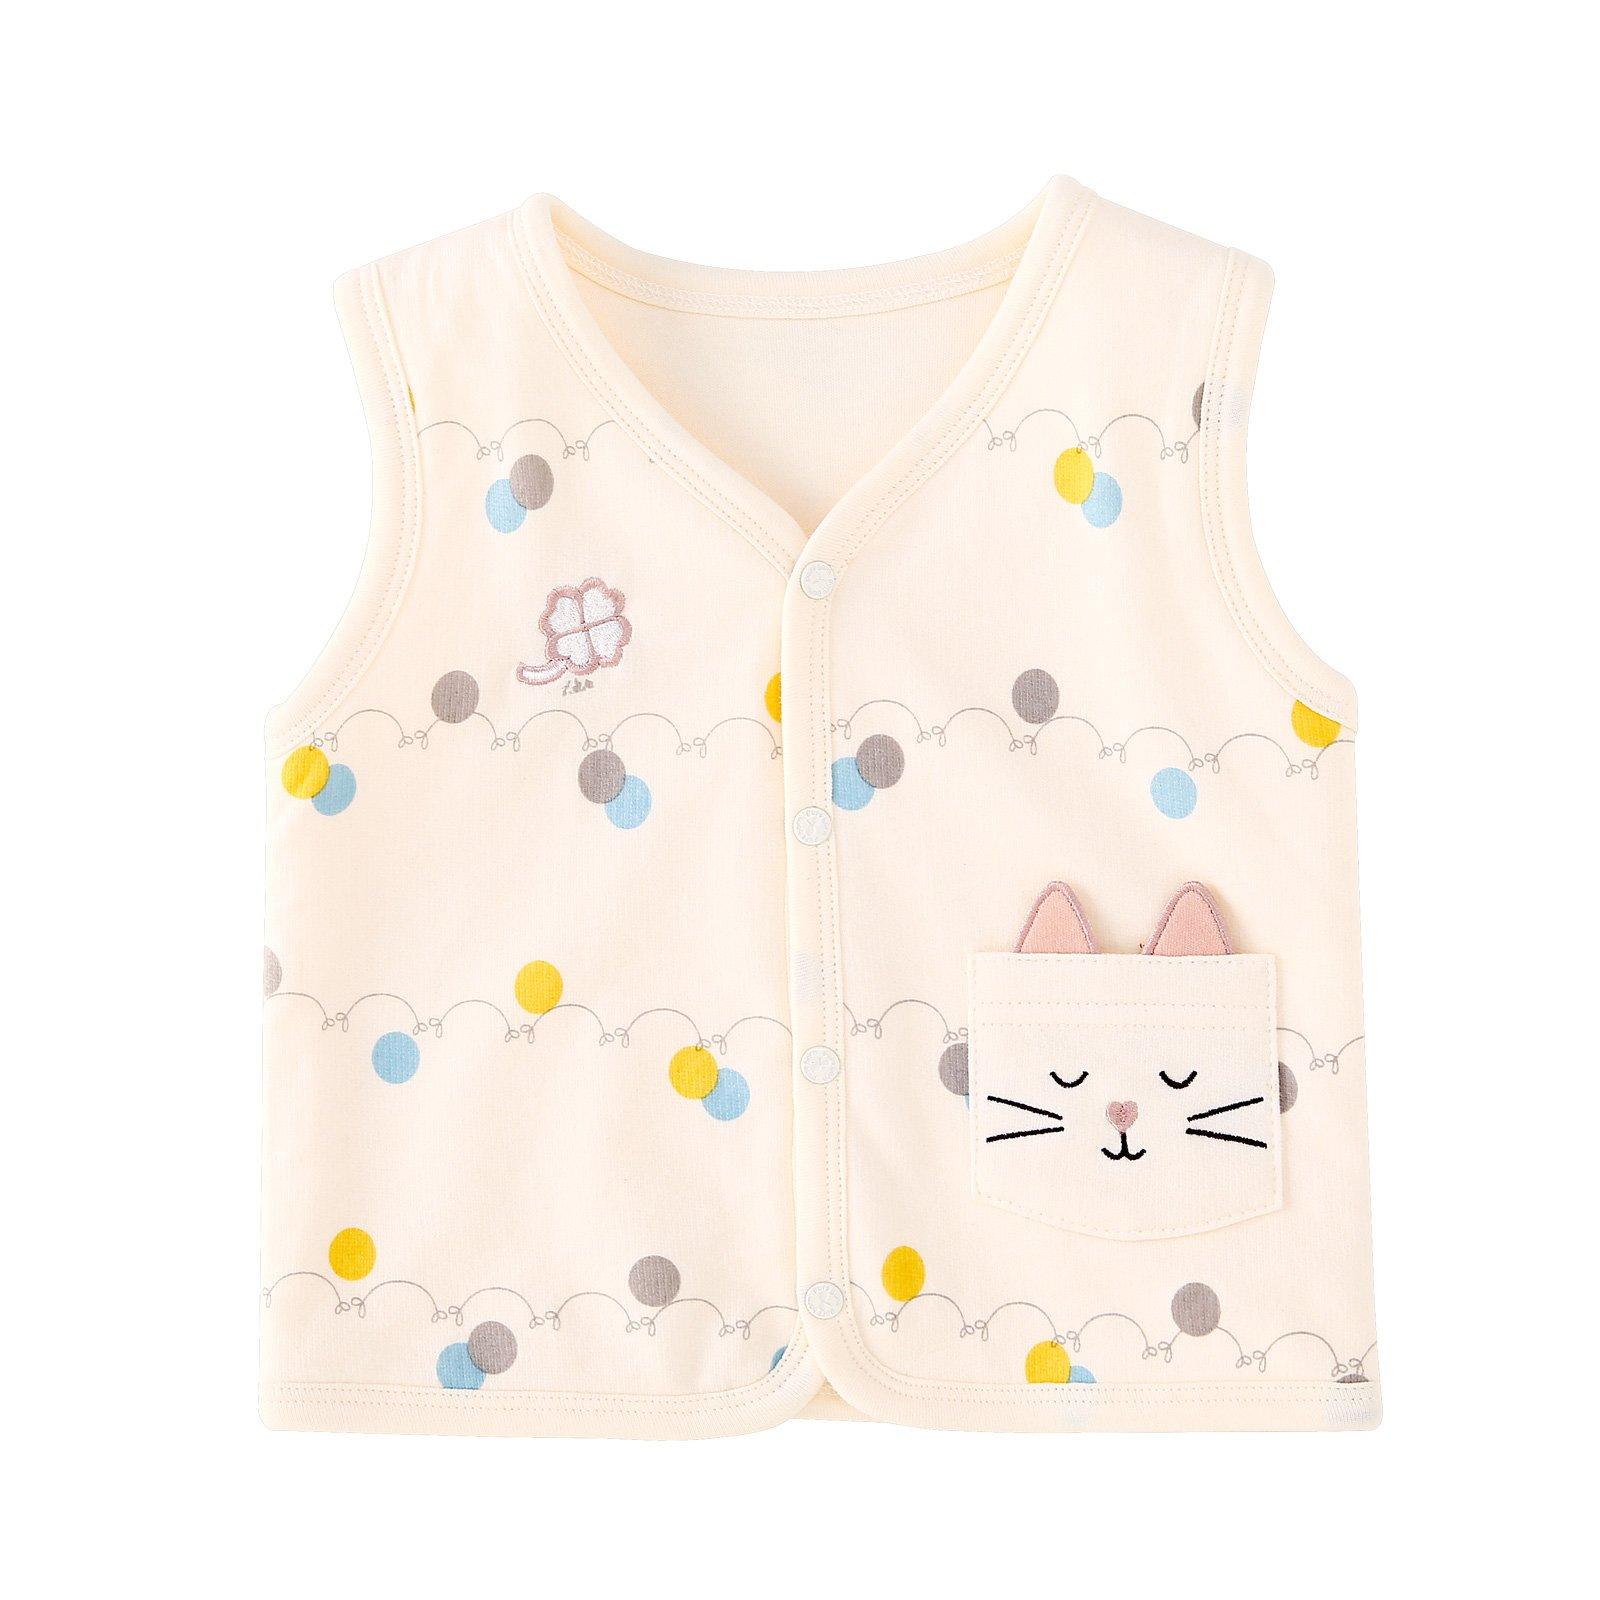 pureborn Baby Girls Boys Sleeveless Vests Cotton